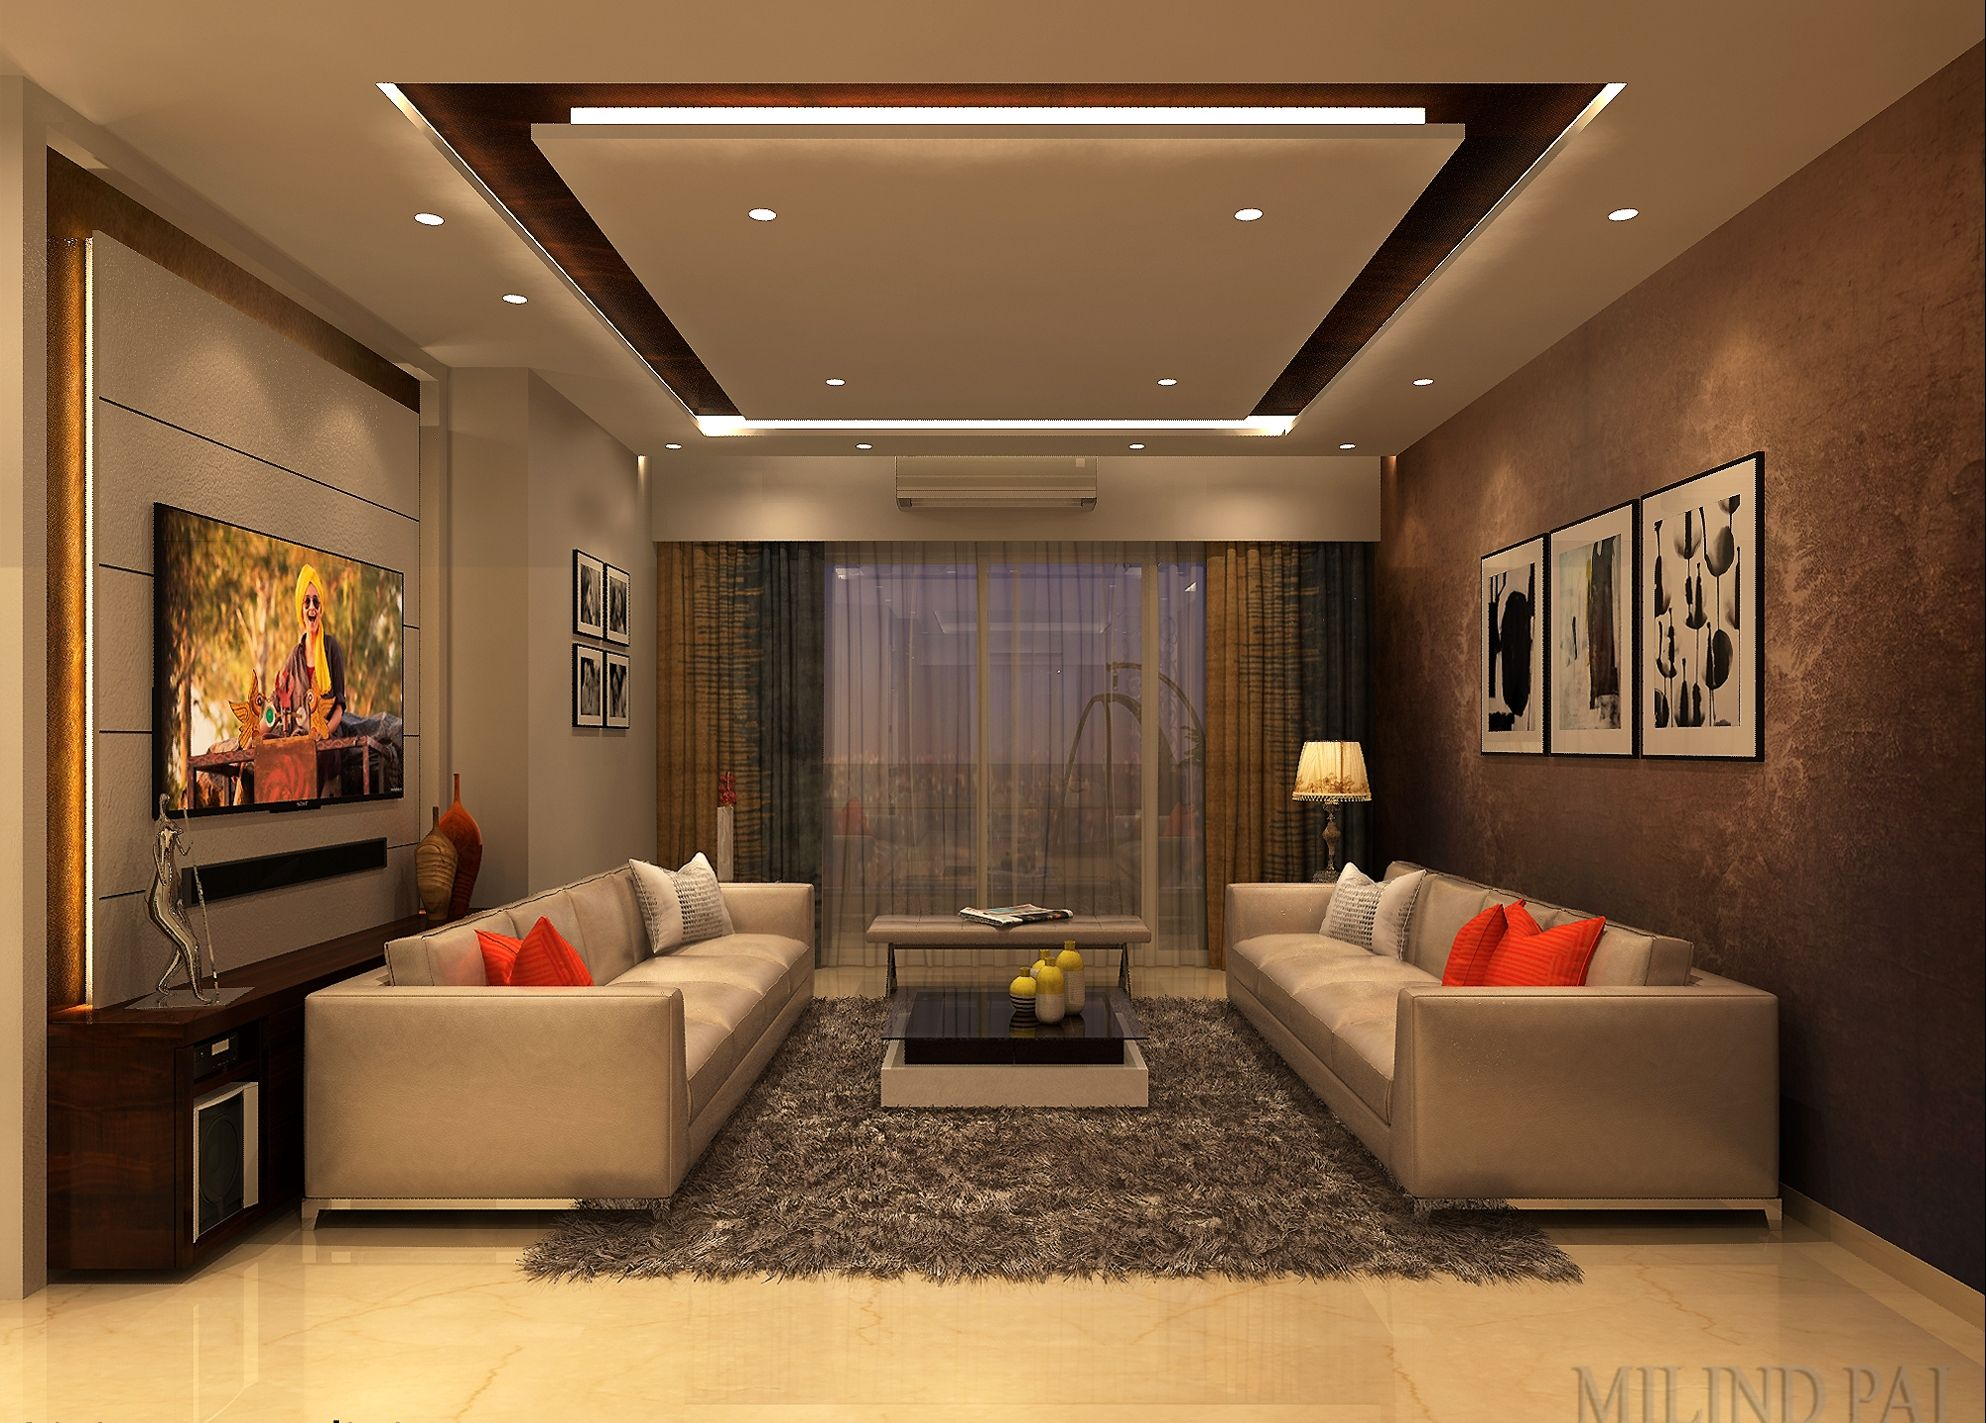 Pin By Shahana Fathima On False Ceiling Design Skk Ceiling